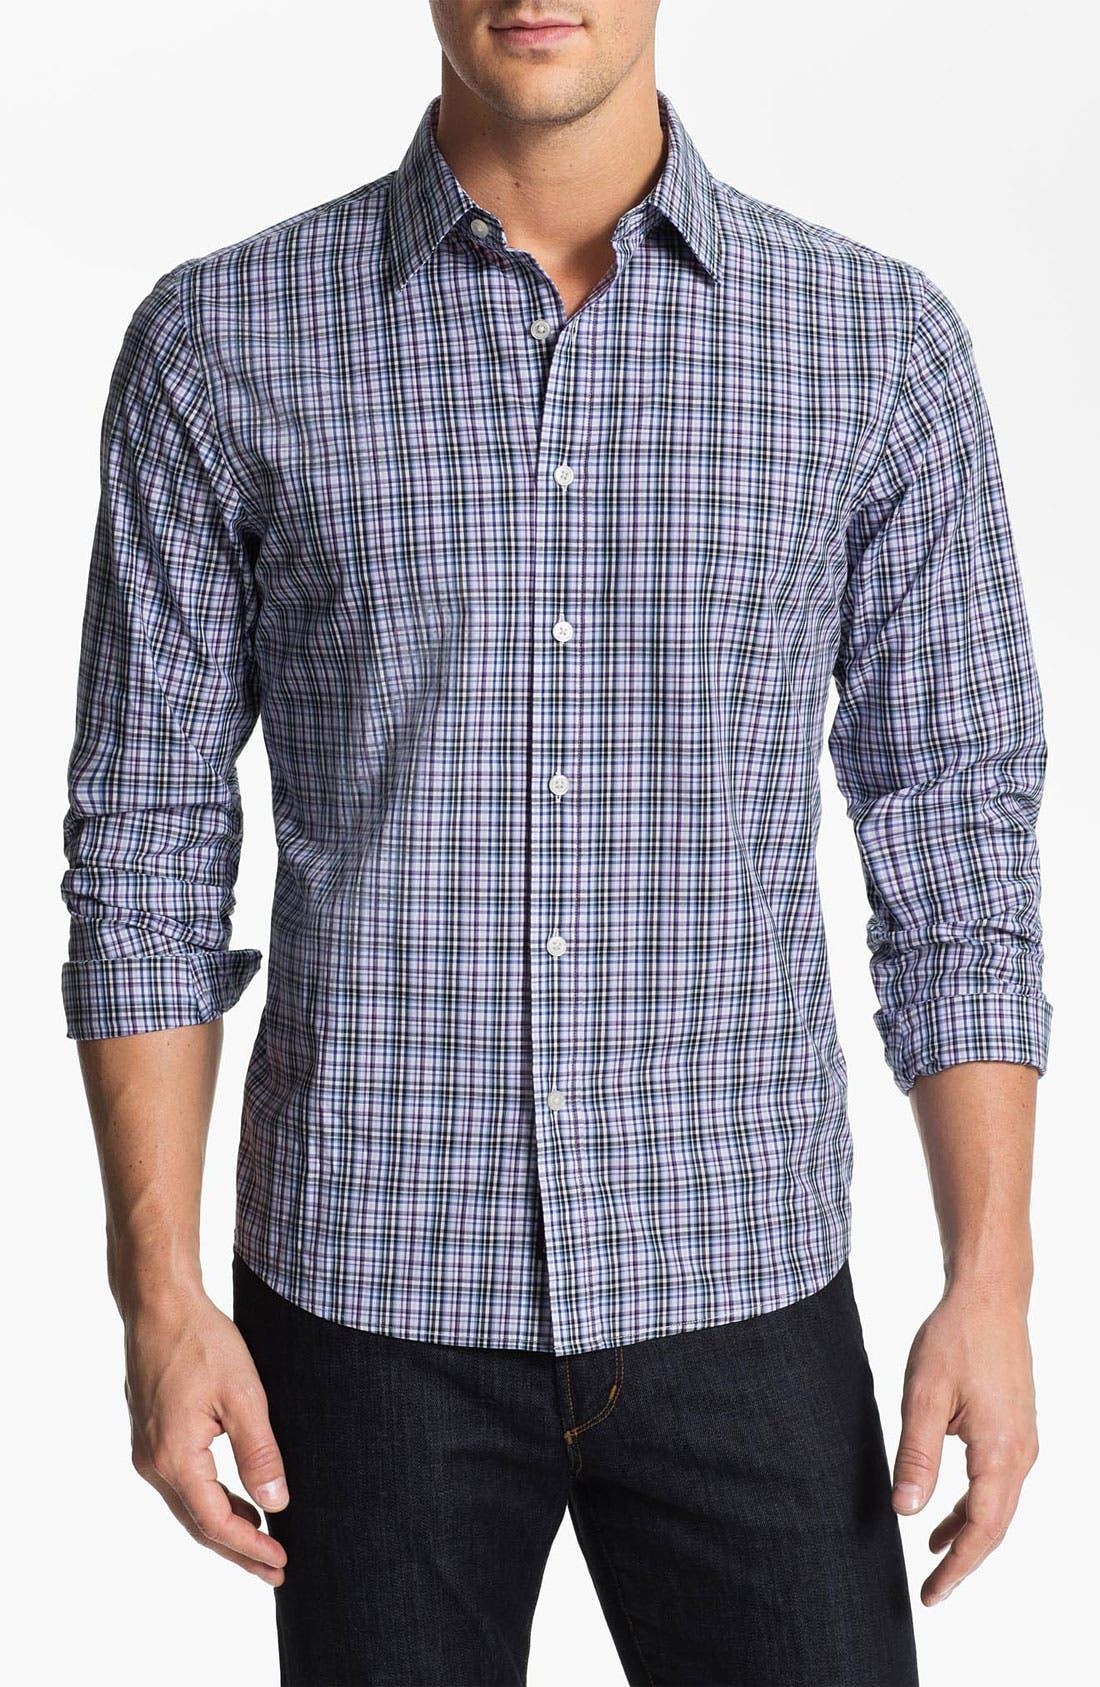 Alternate Image 1 Selected - Michael Kors 'Morgan Check' Sport Shirt